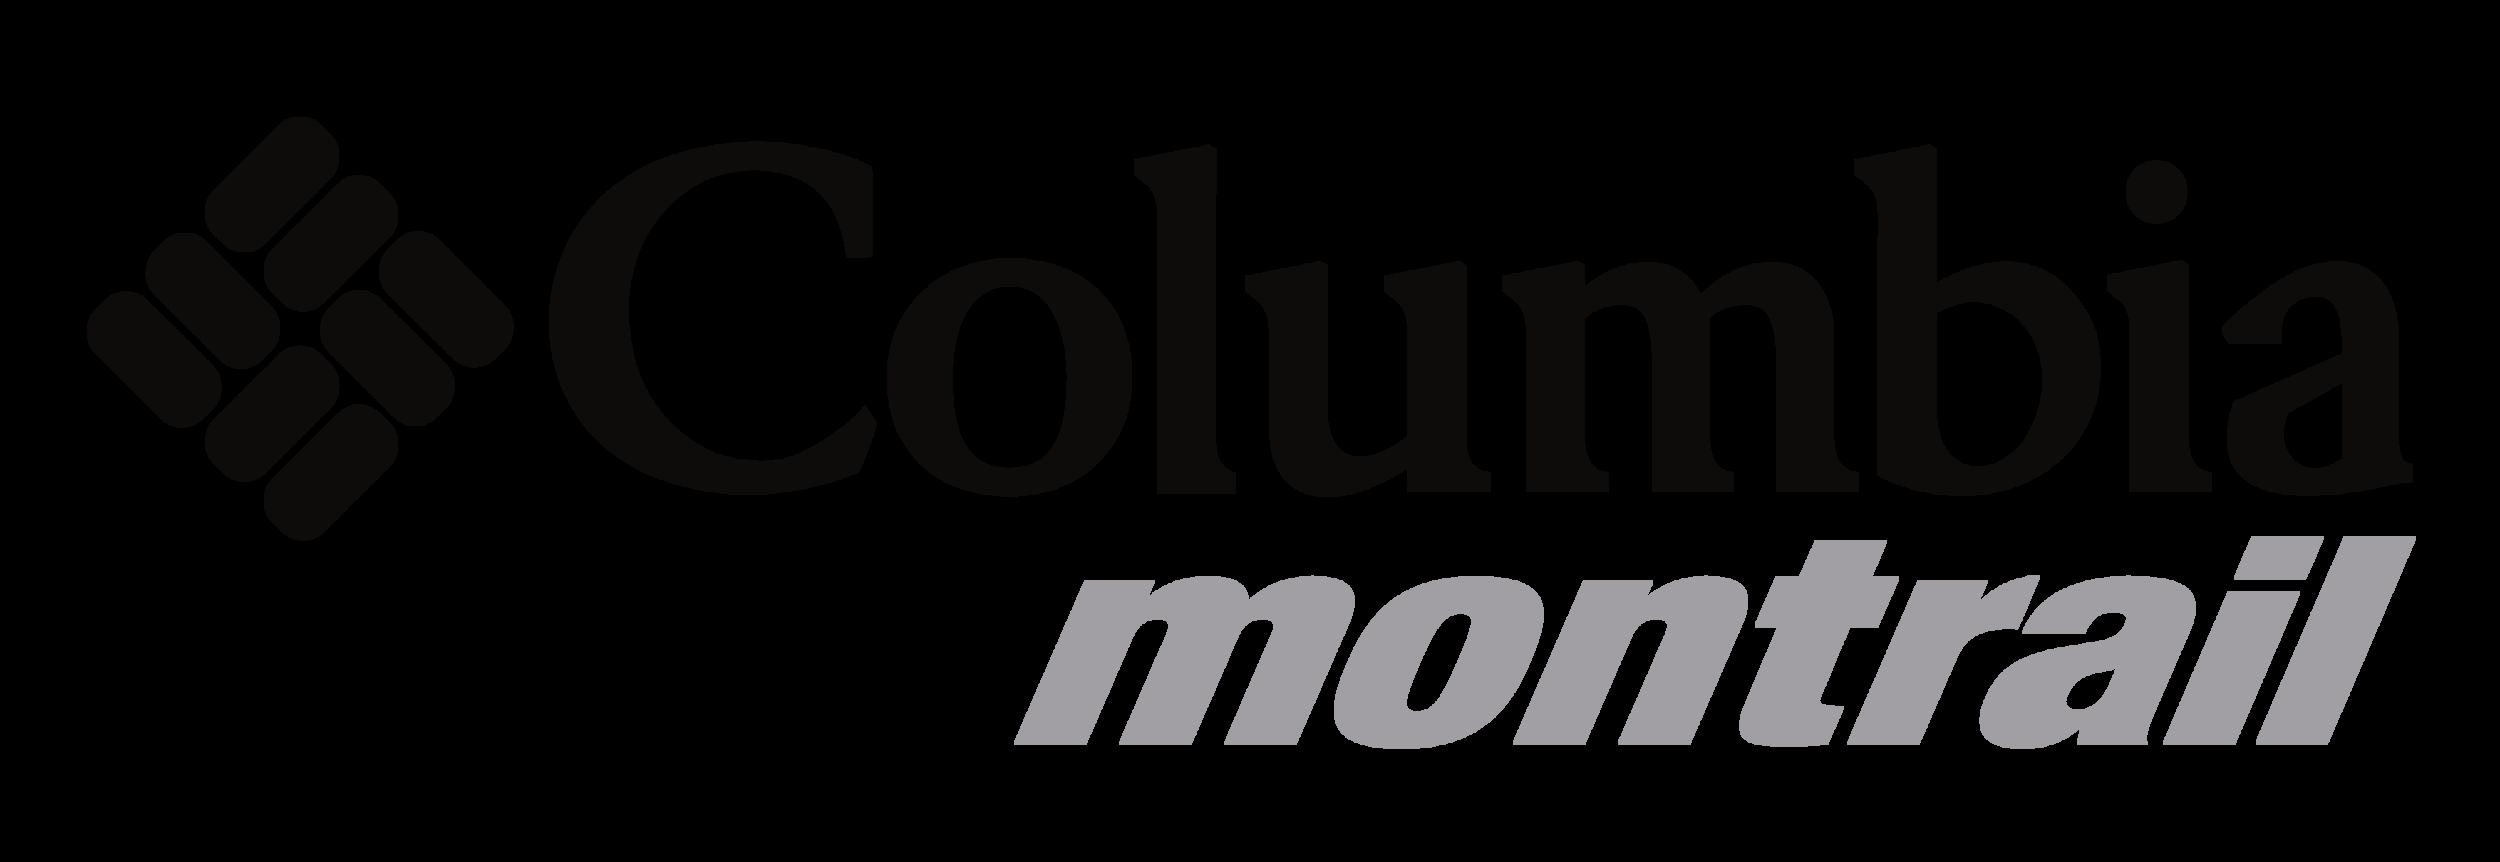 Columbia_Montrail_Logo_BlackGray.png